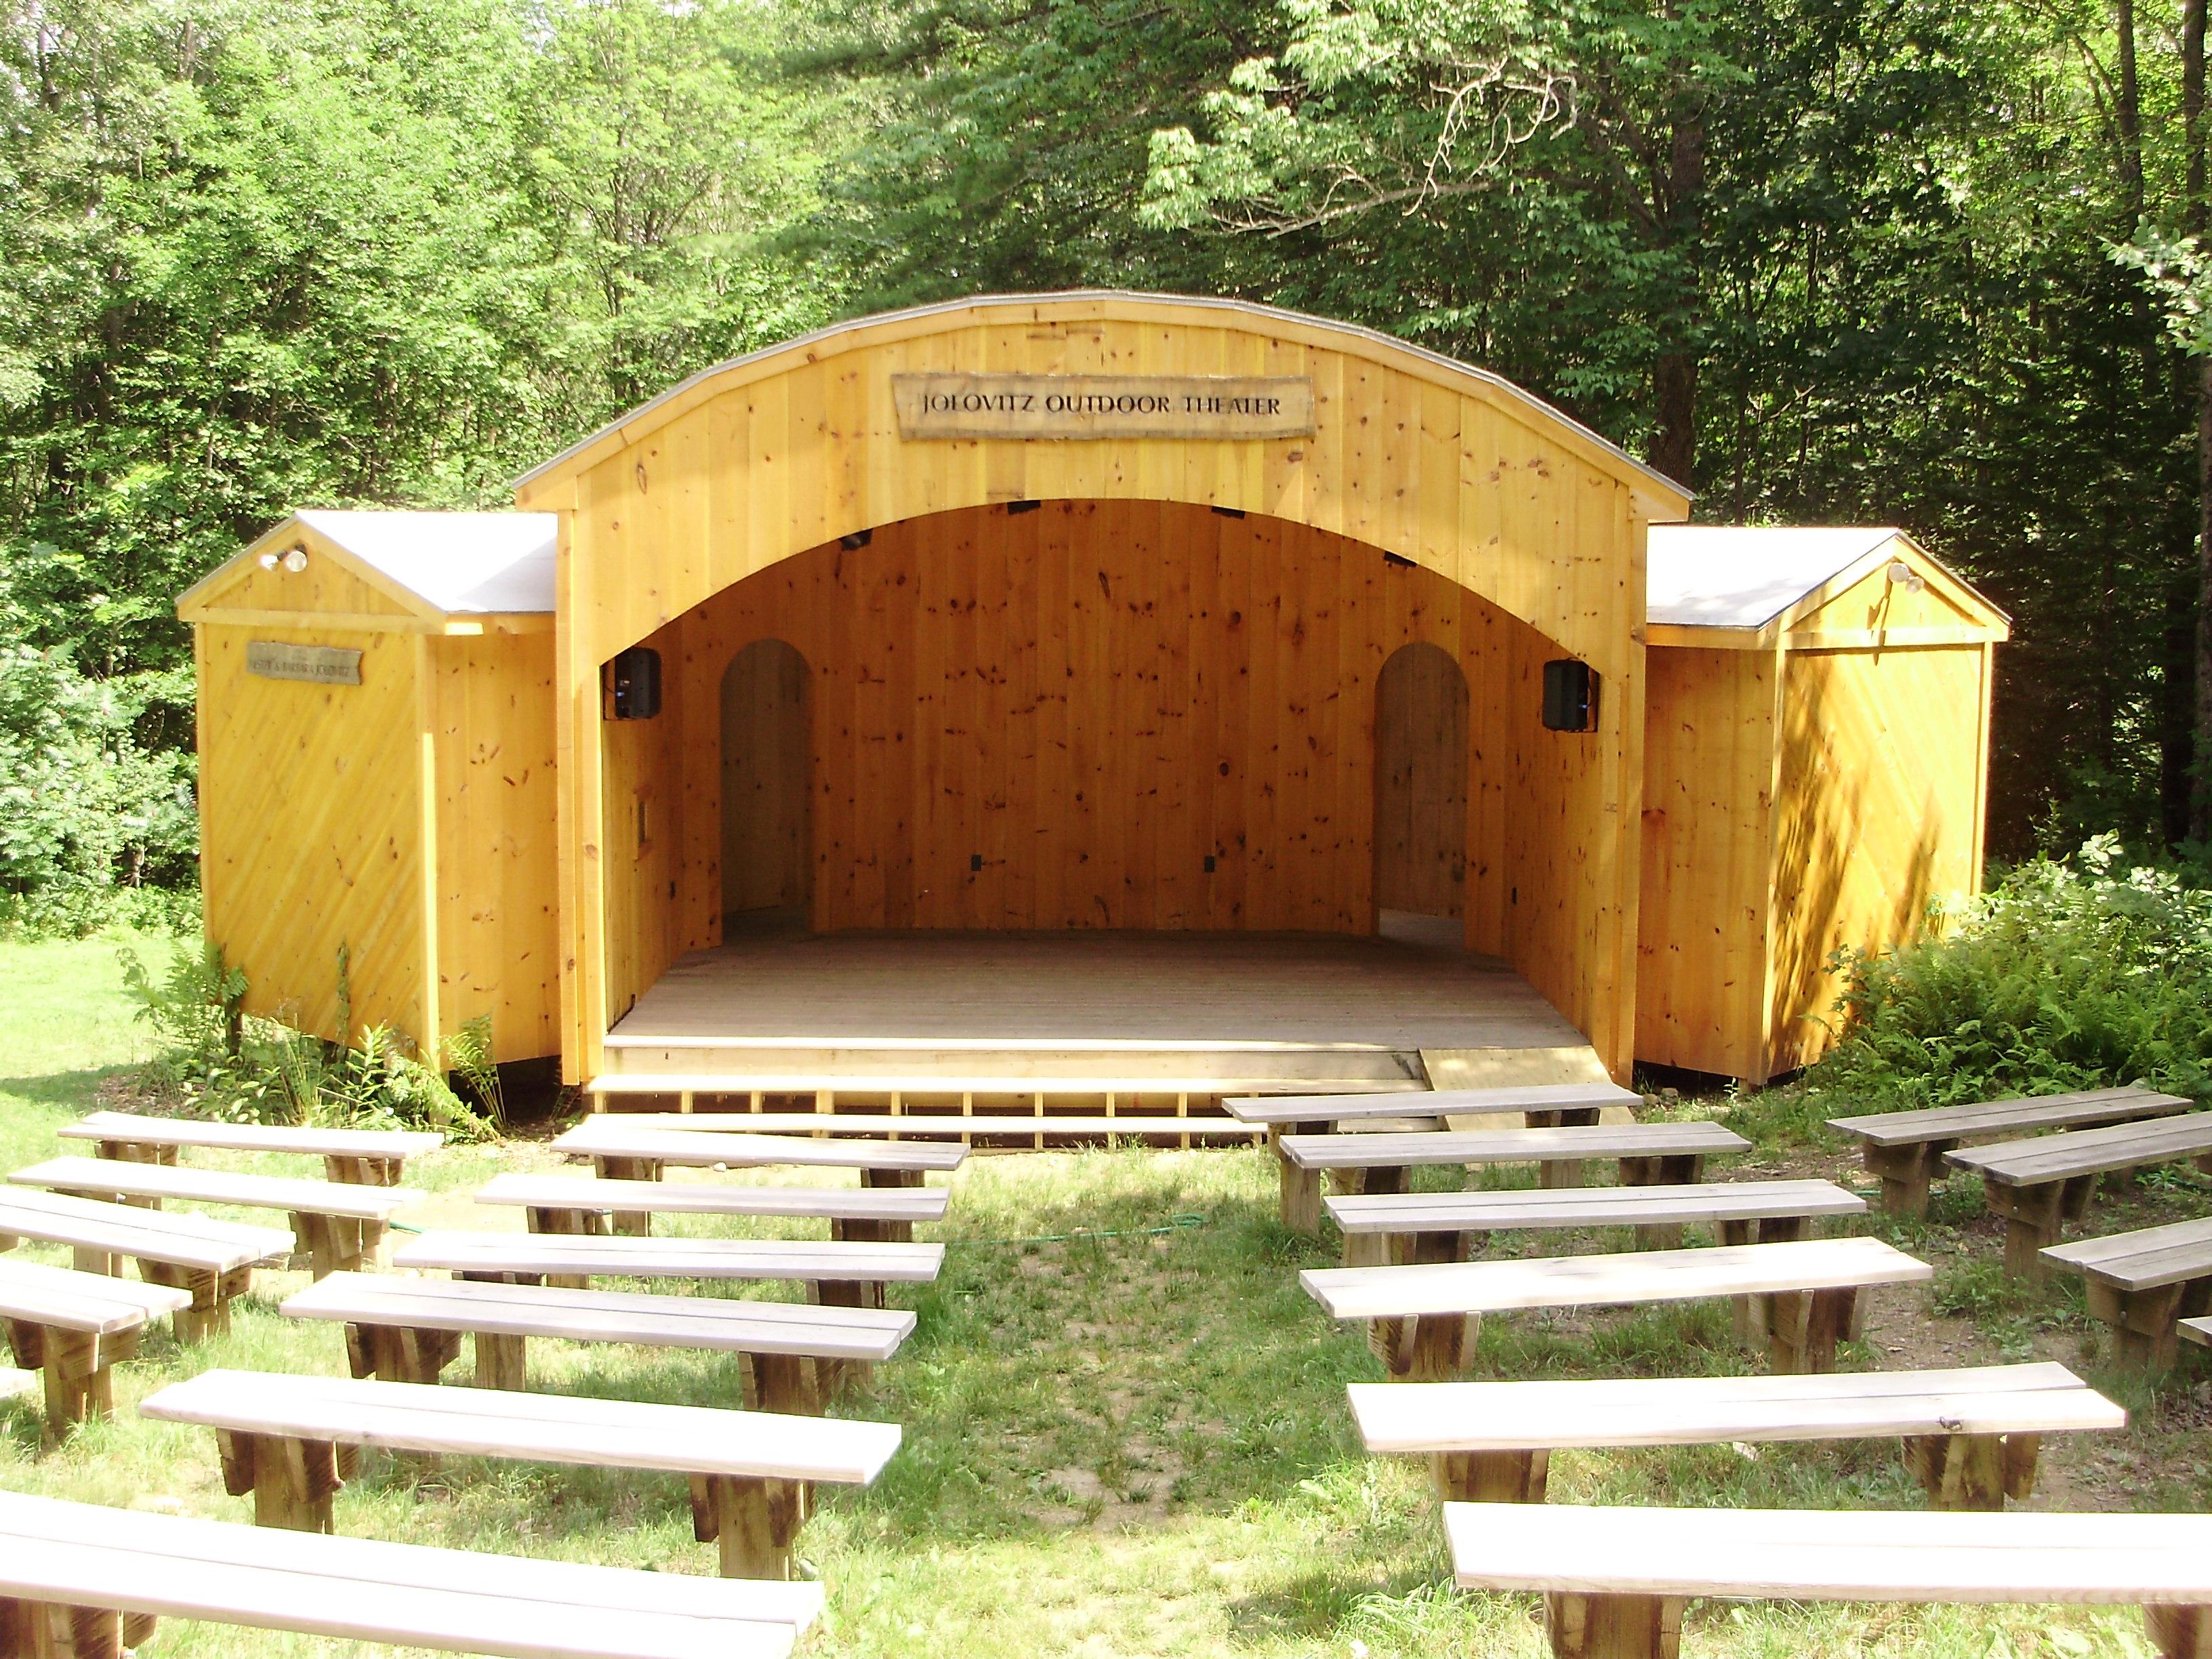 Jolovitz Outdoor Theatre